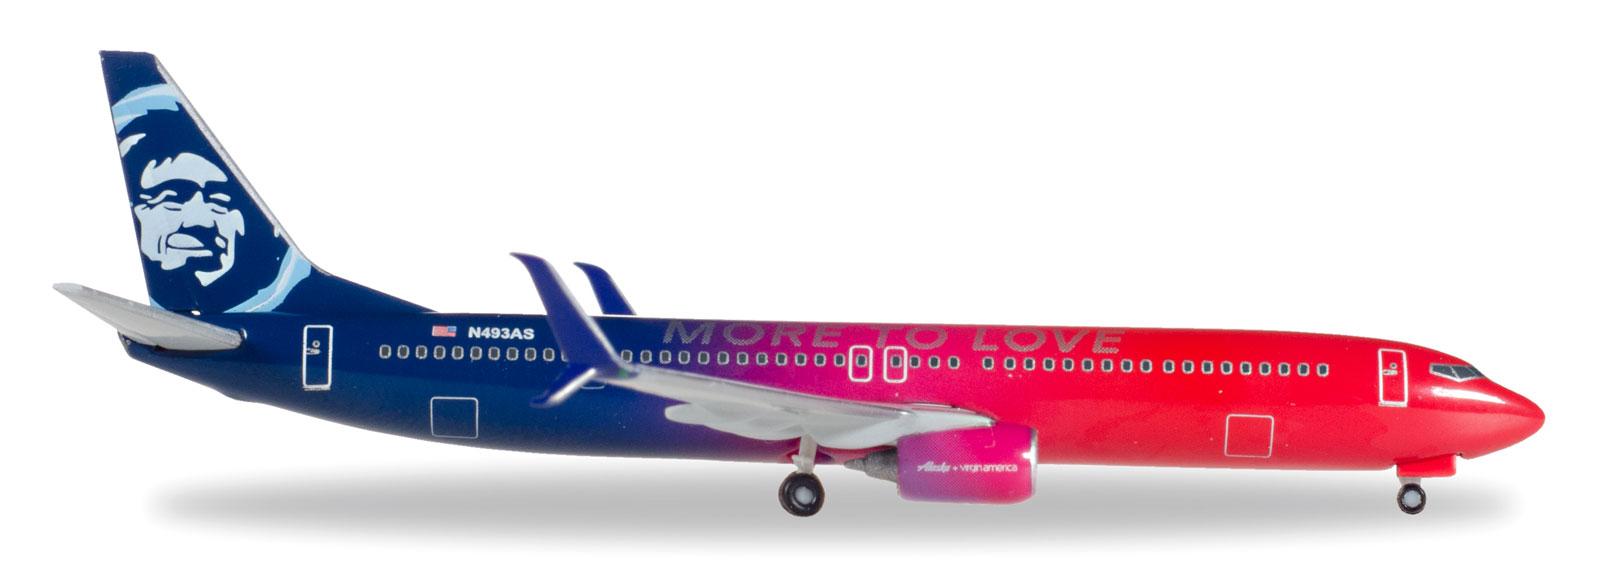 Herpa Wings 1:500  Boeing 737-900ER  Delta Air Lines  531382  Modellairport500